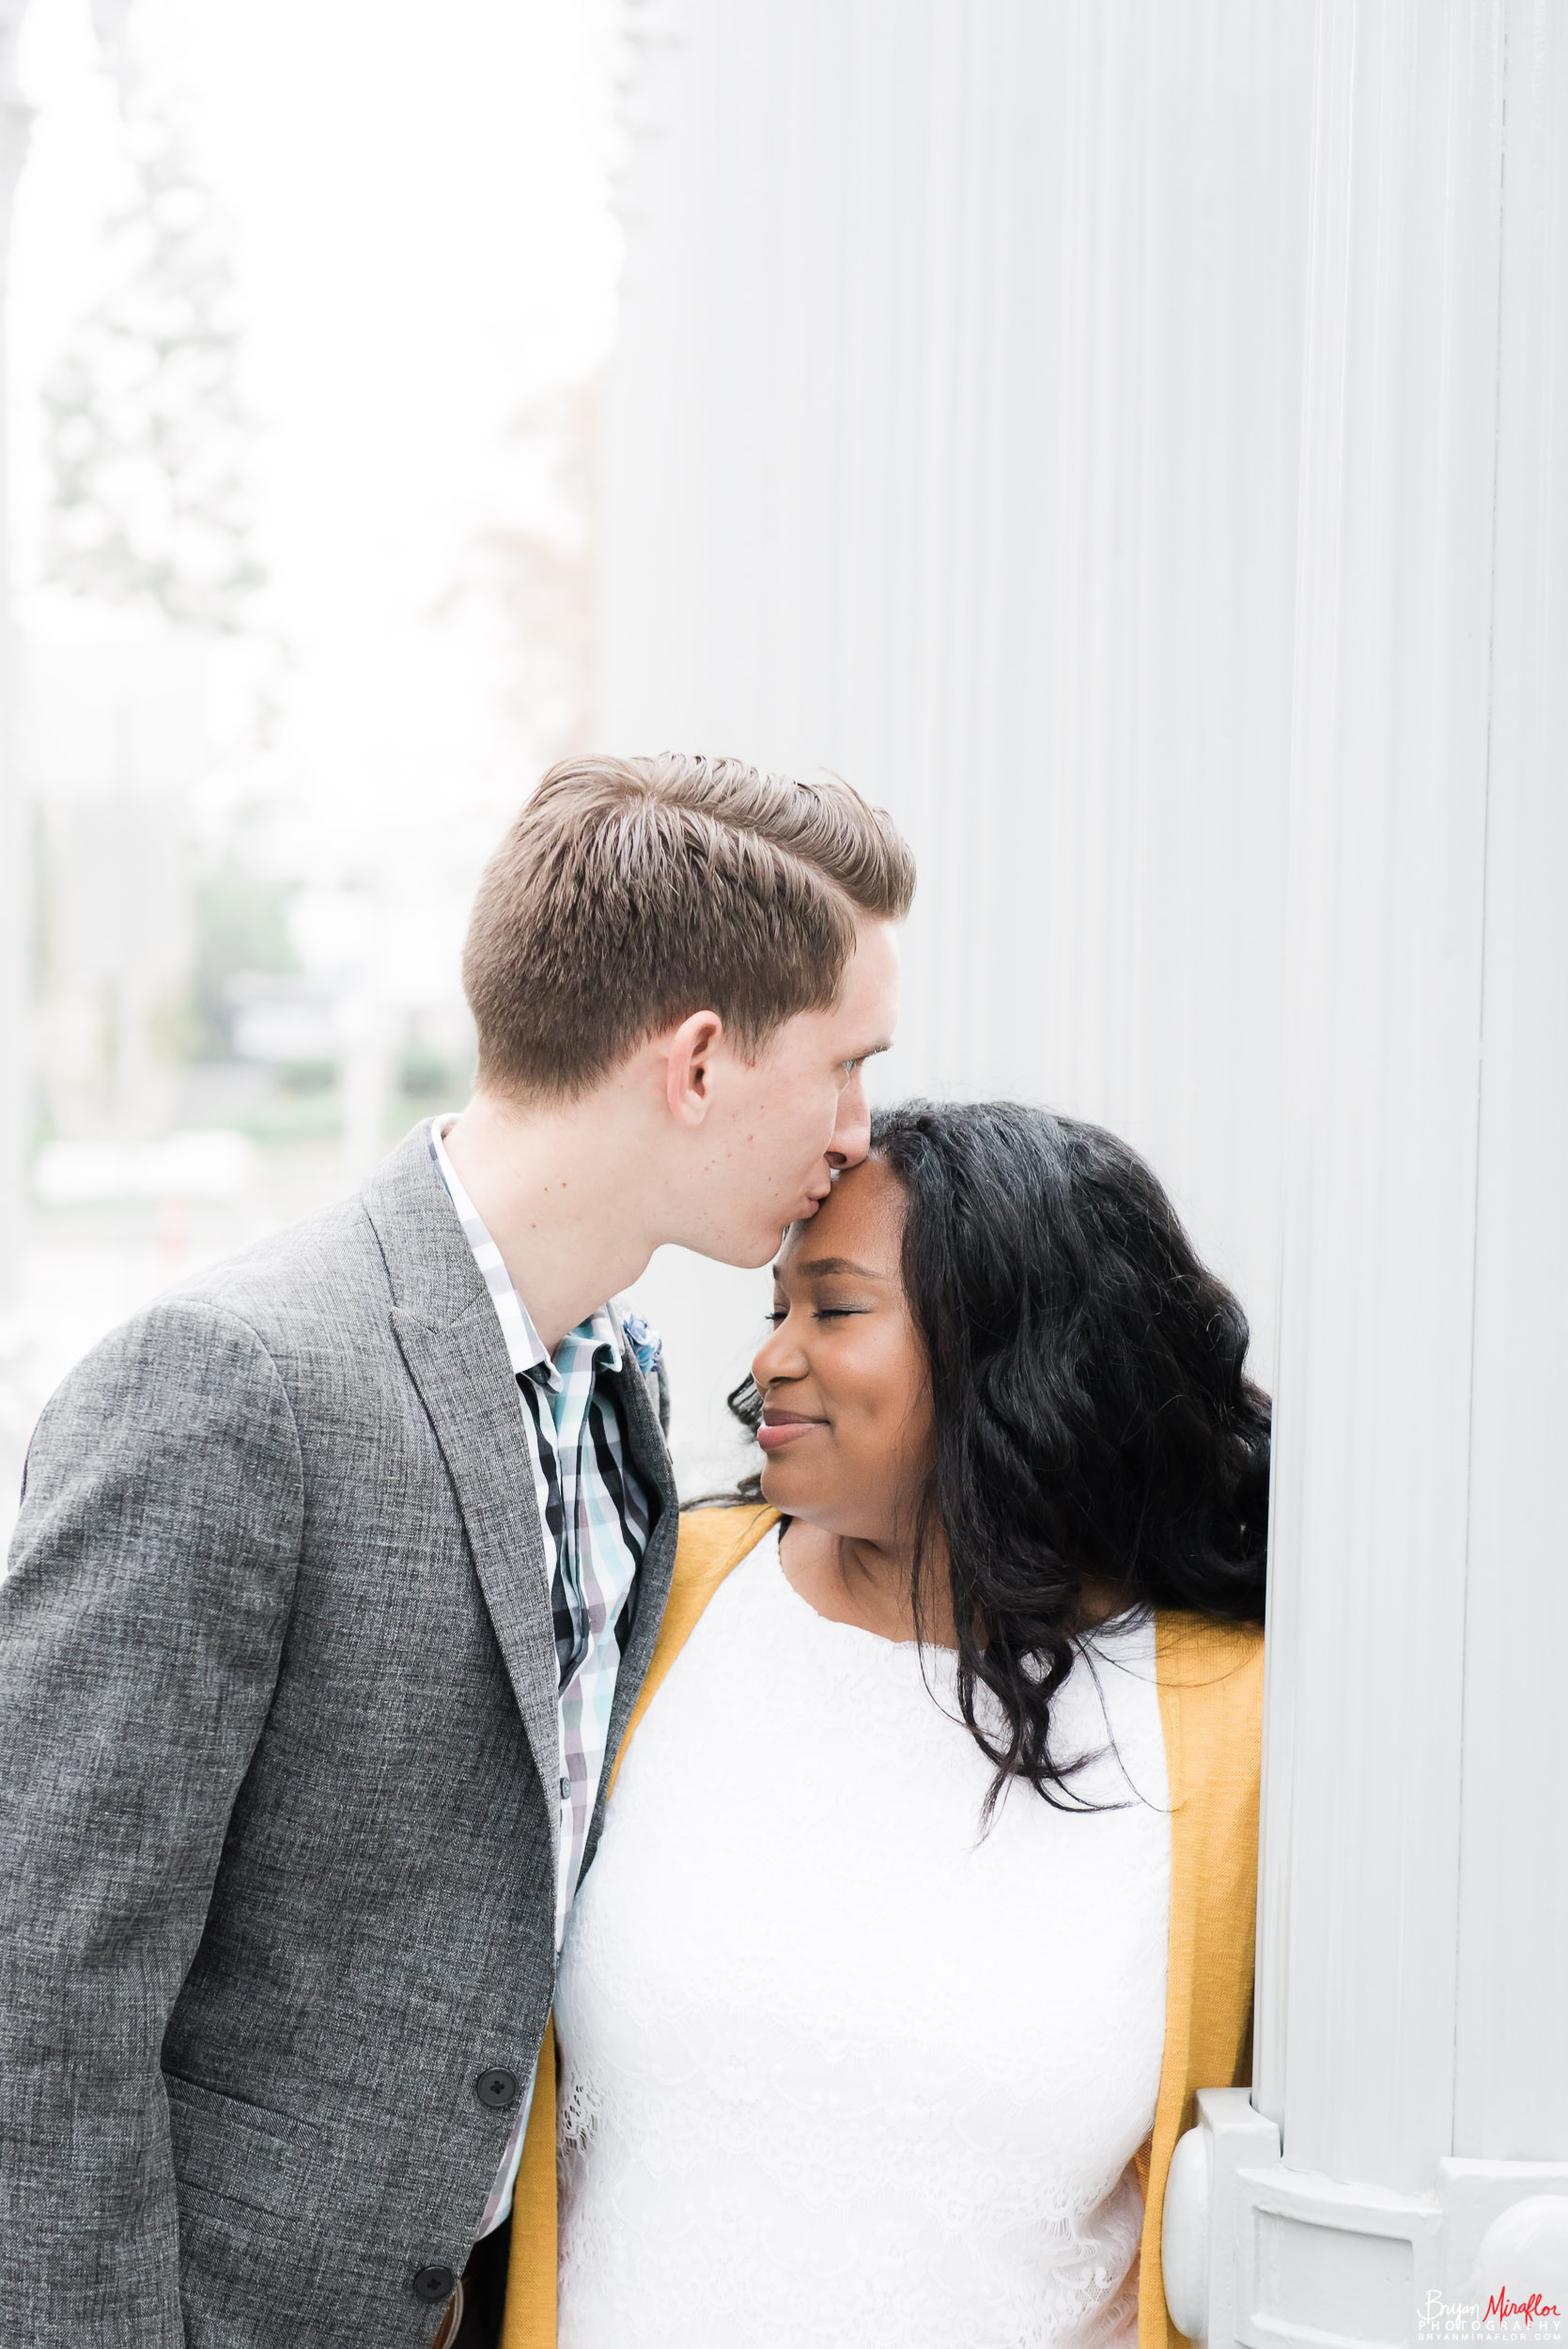 Bryan-Miraflor-Photography-Vanessa-Tommy-LACMA-DTLA-Engagement-Photoshoot-20161210-95.jpg